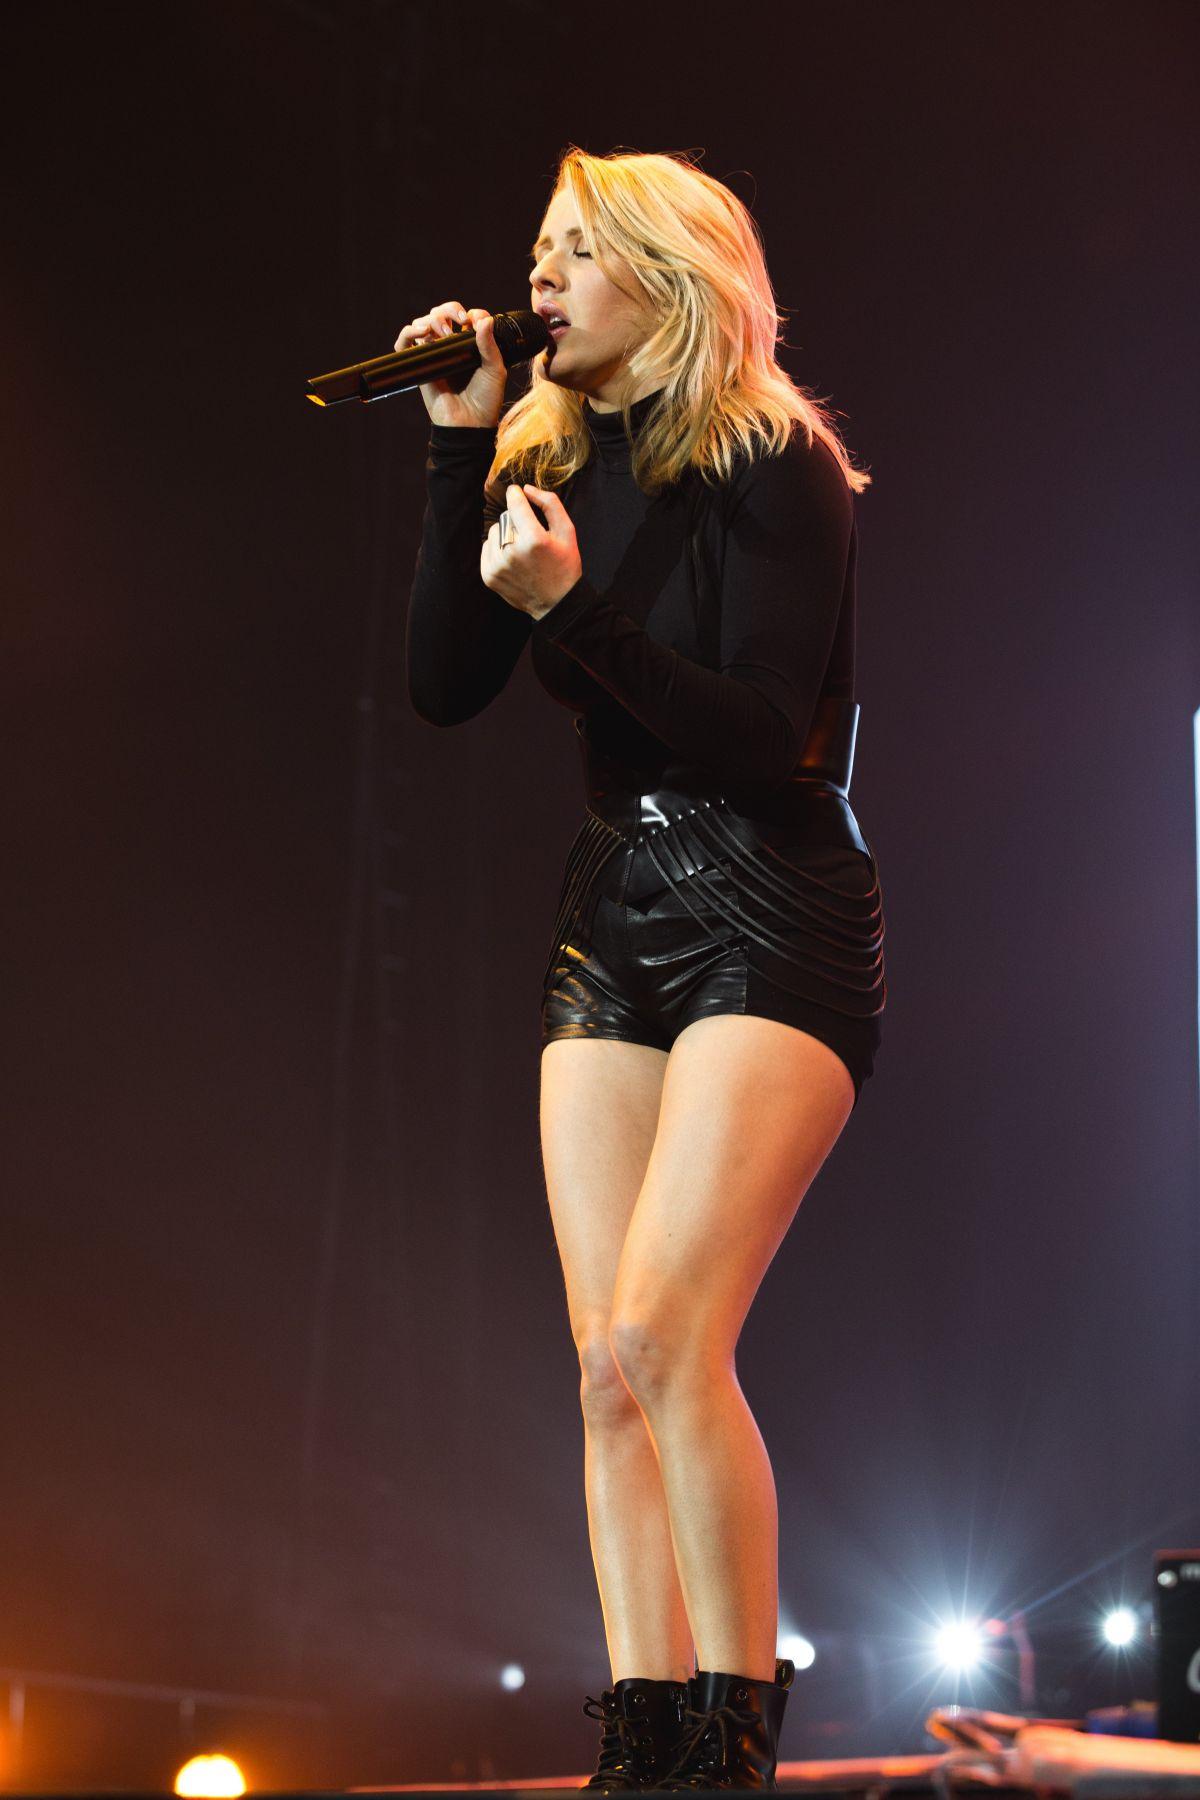 Ellie Goulding performs at Capital FM Arena in Nottingham